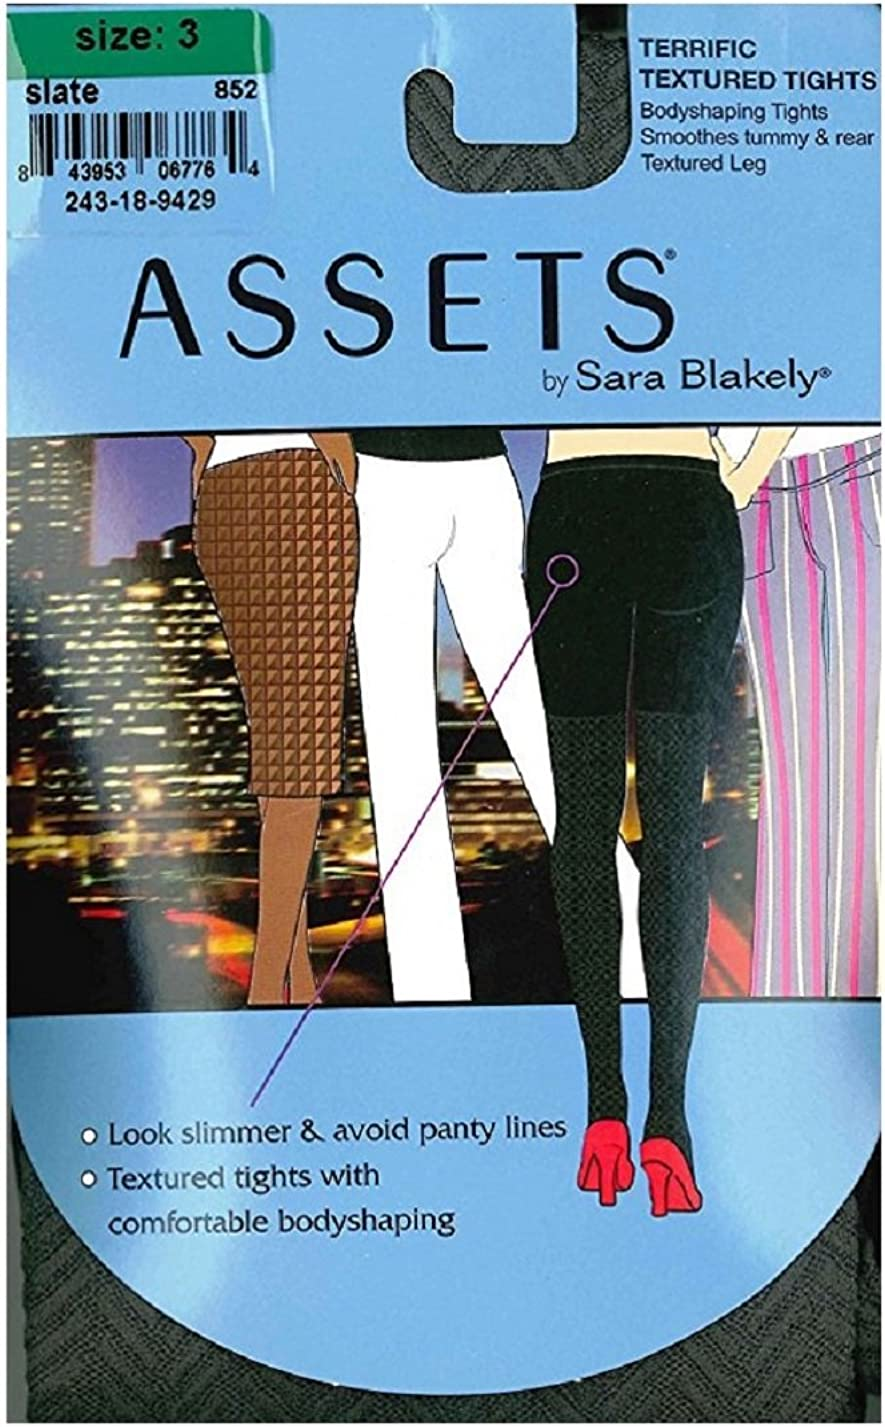 Assets Terrific Textured Tights